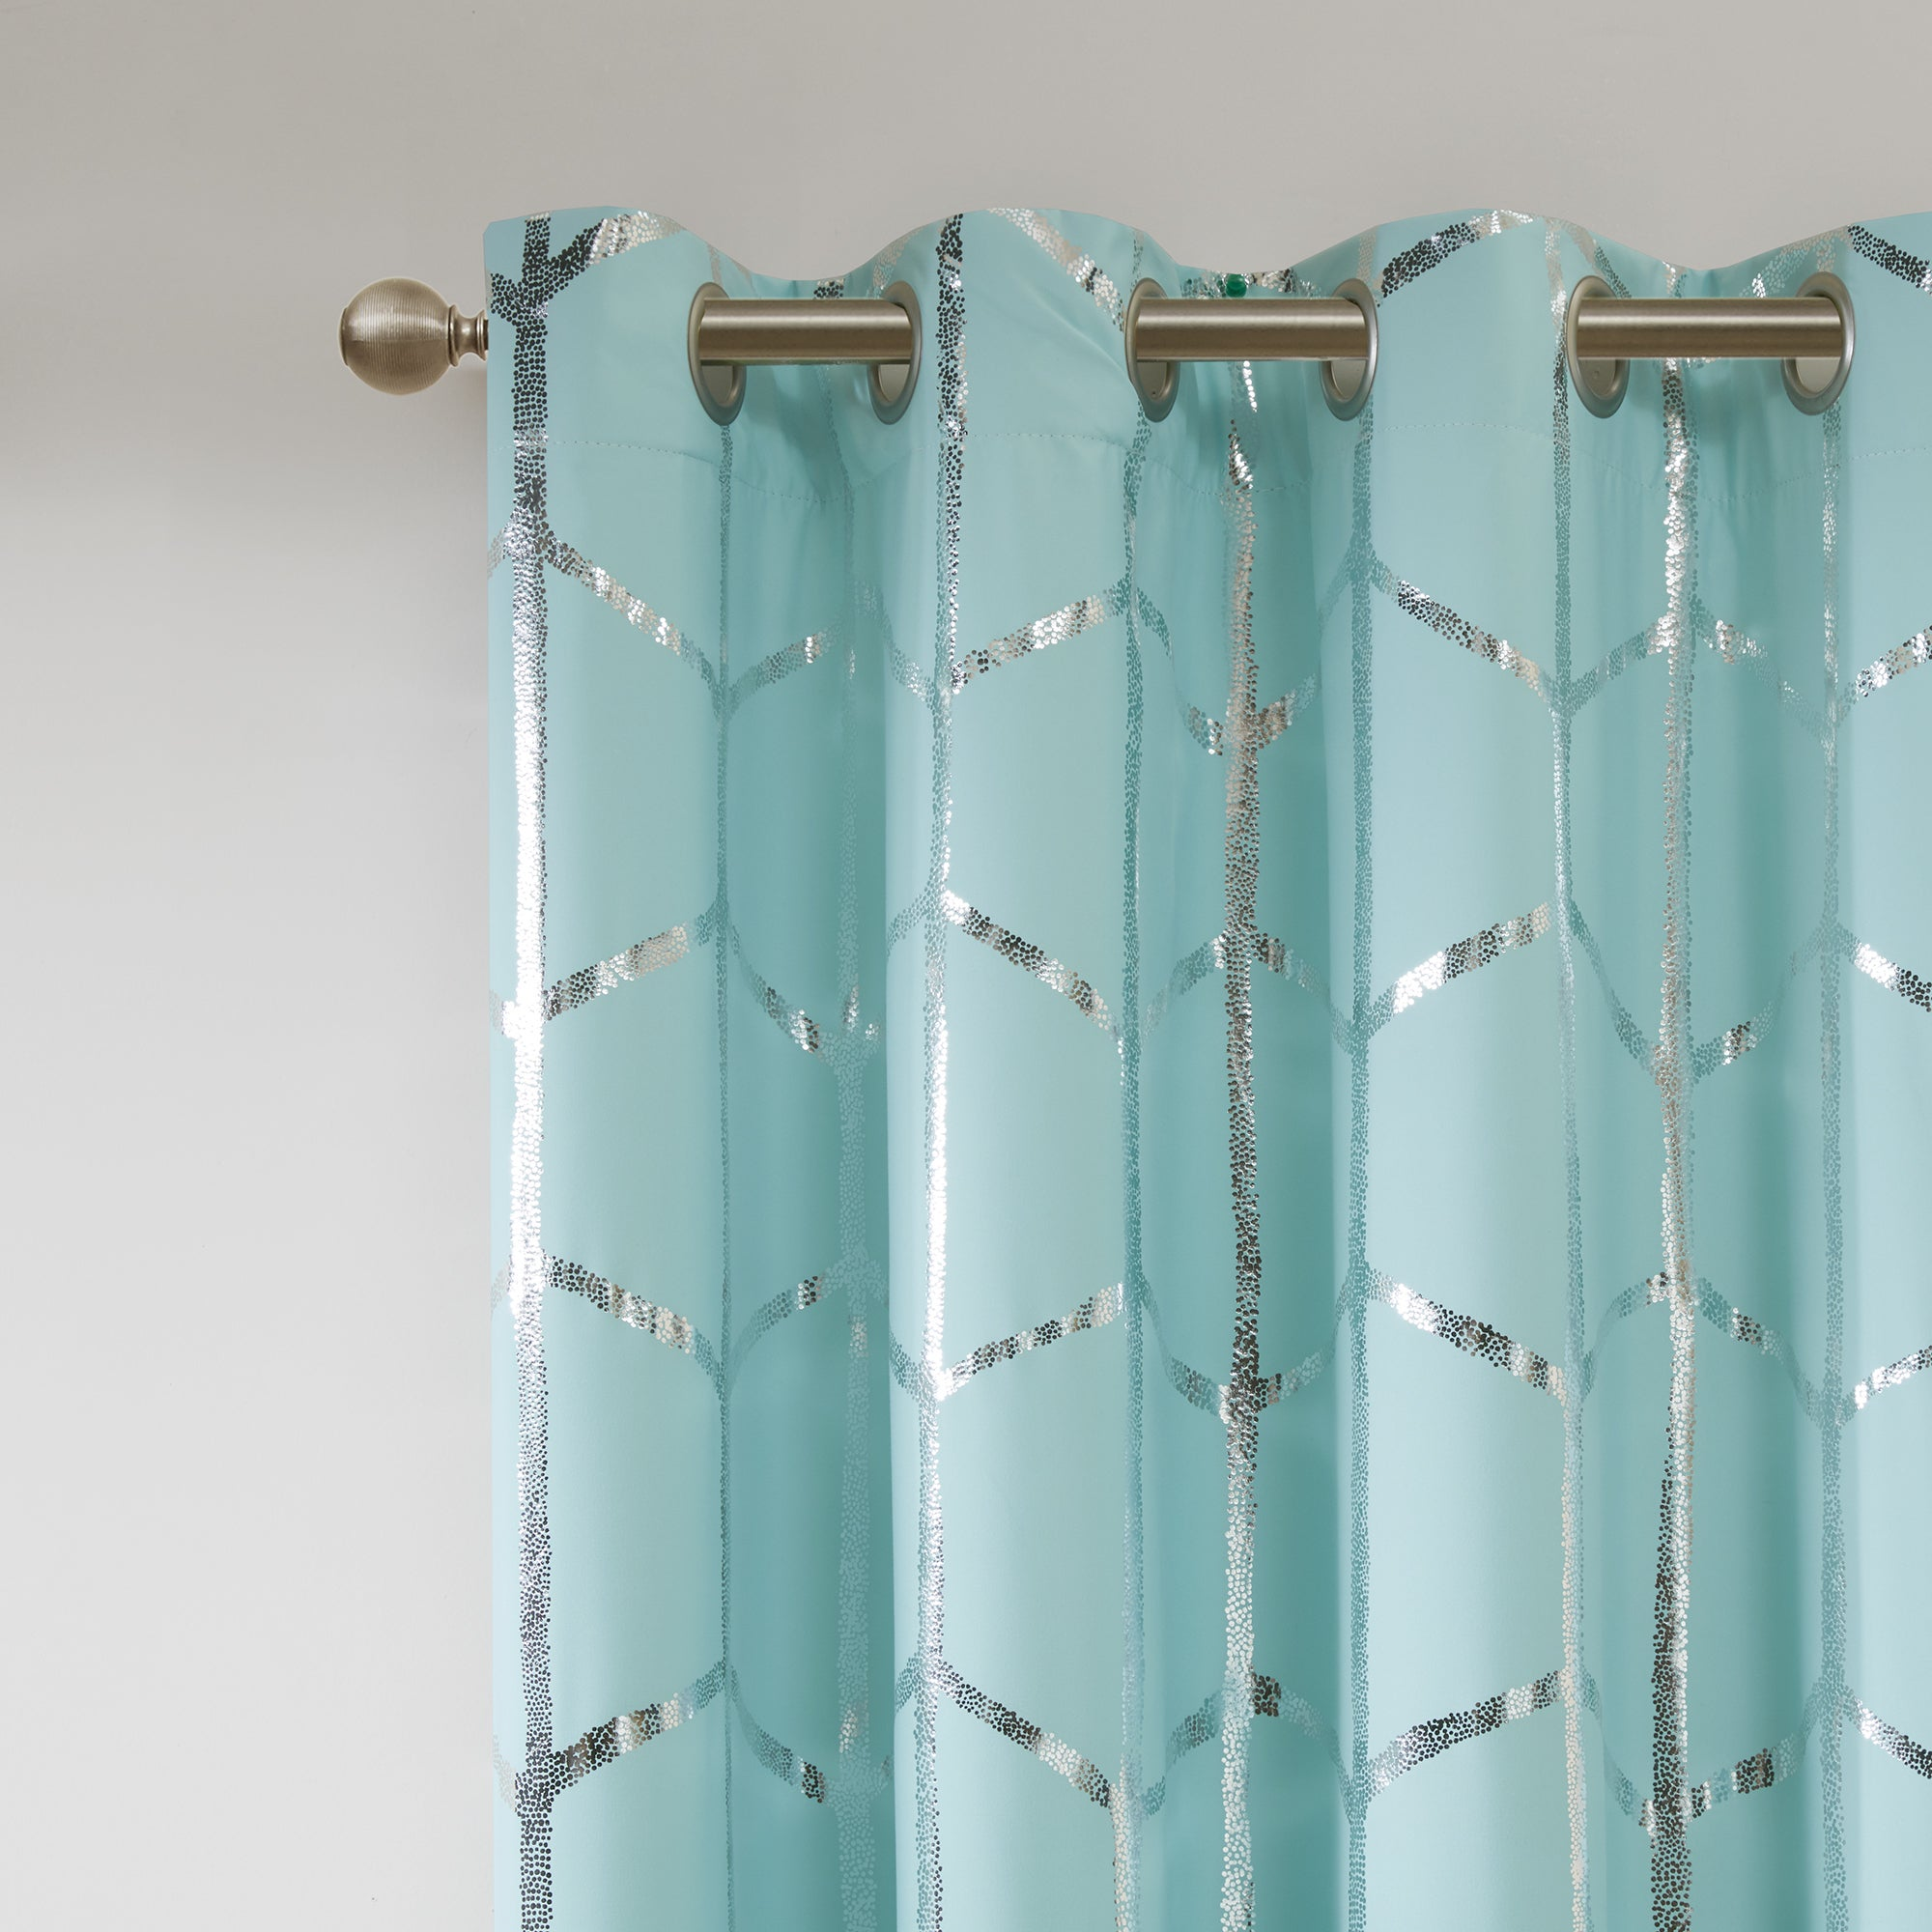 Intelligent Design Khloe Blackout Metallic Printed Curtain Panel